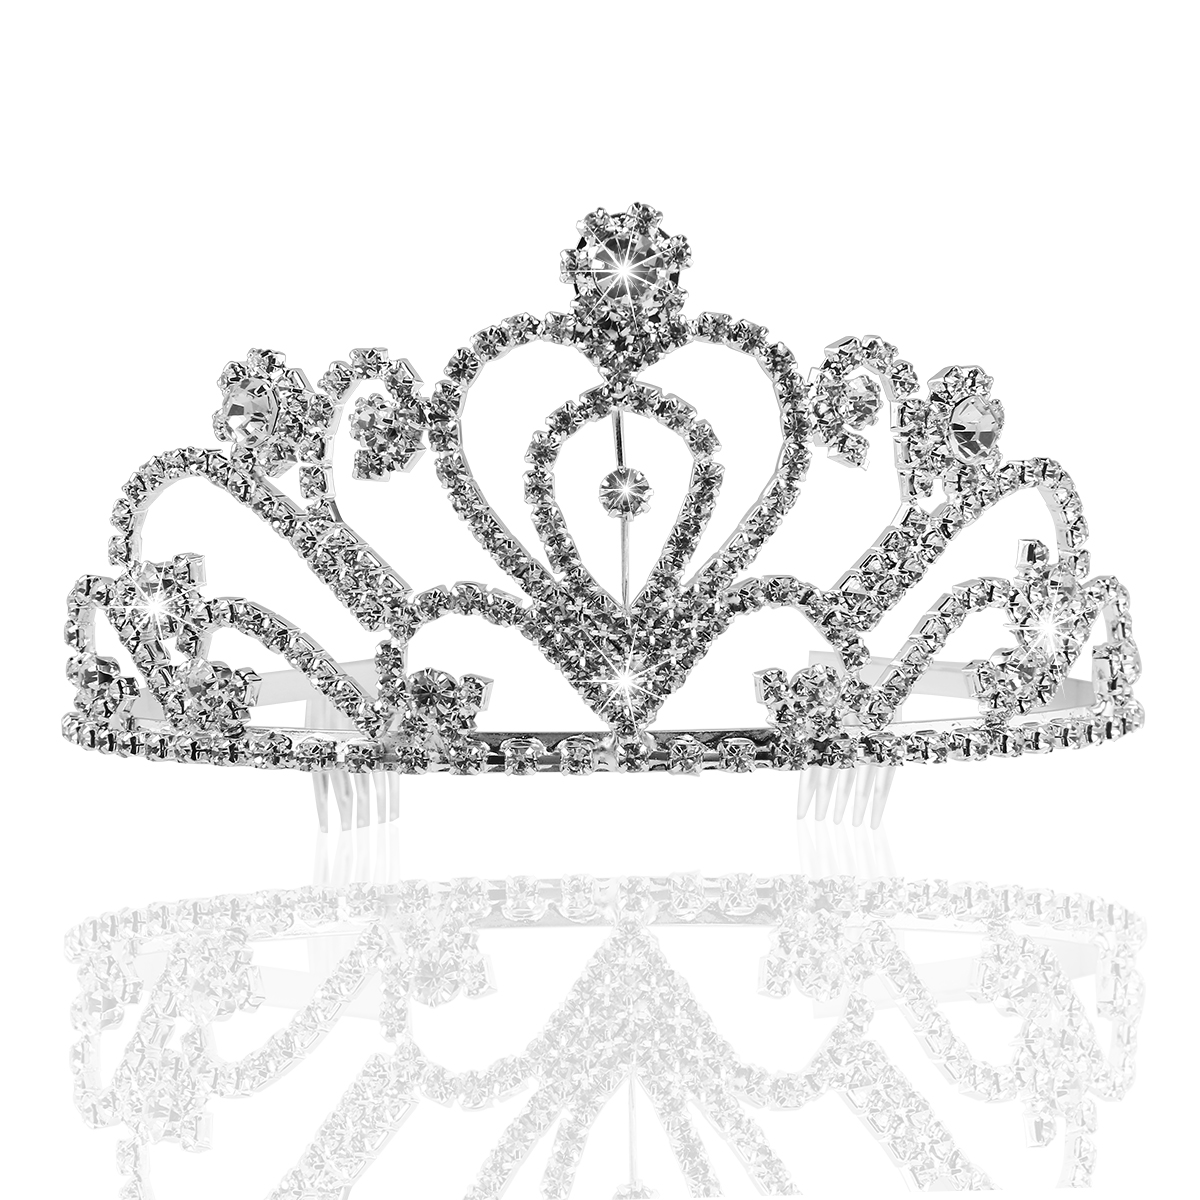 PIXNOR Bride Crown Wedding Rhinestone Decorated Hair Barrettes Hairband Clip Loop